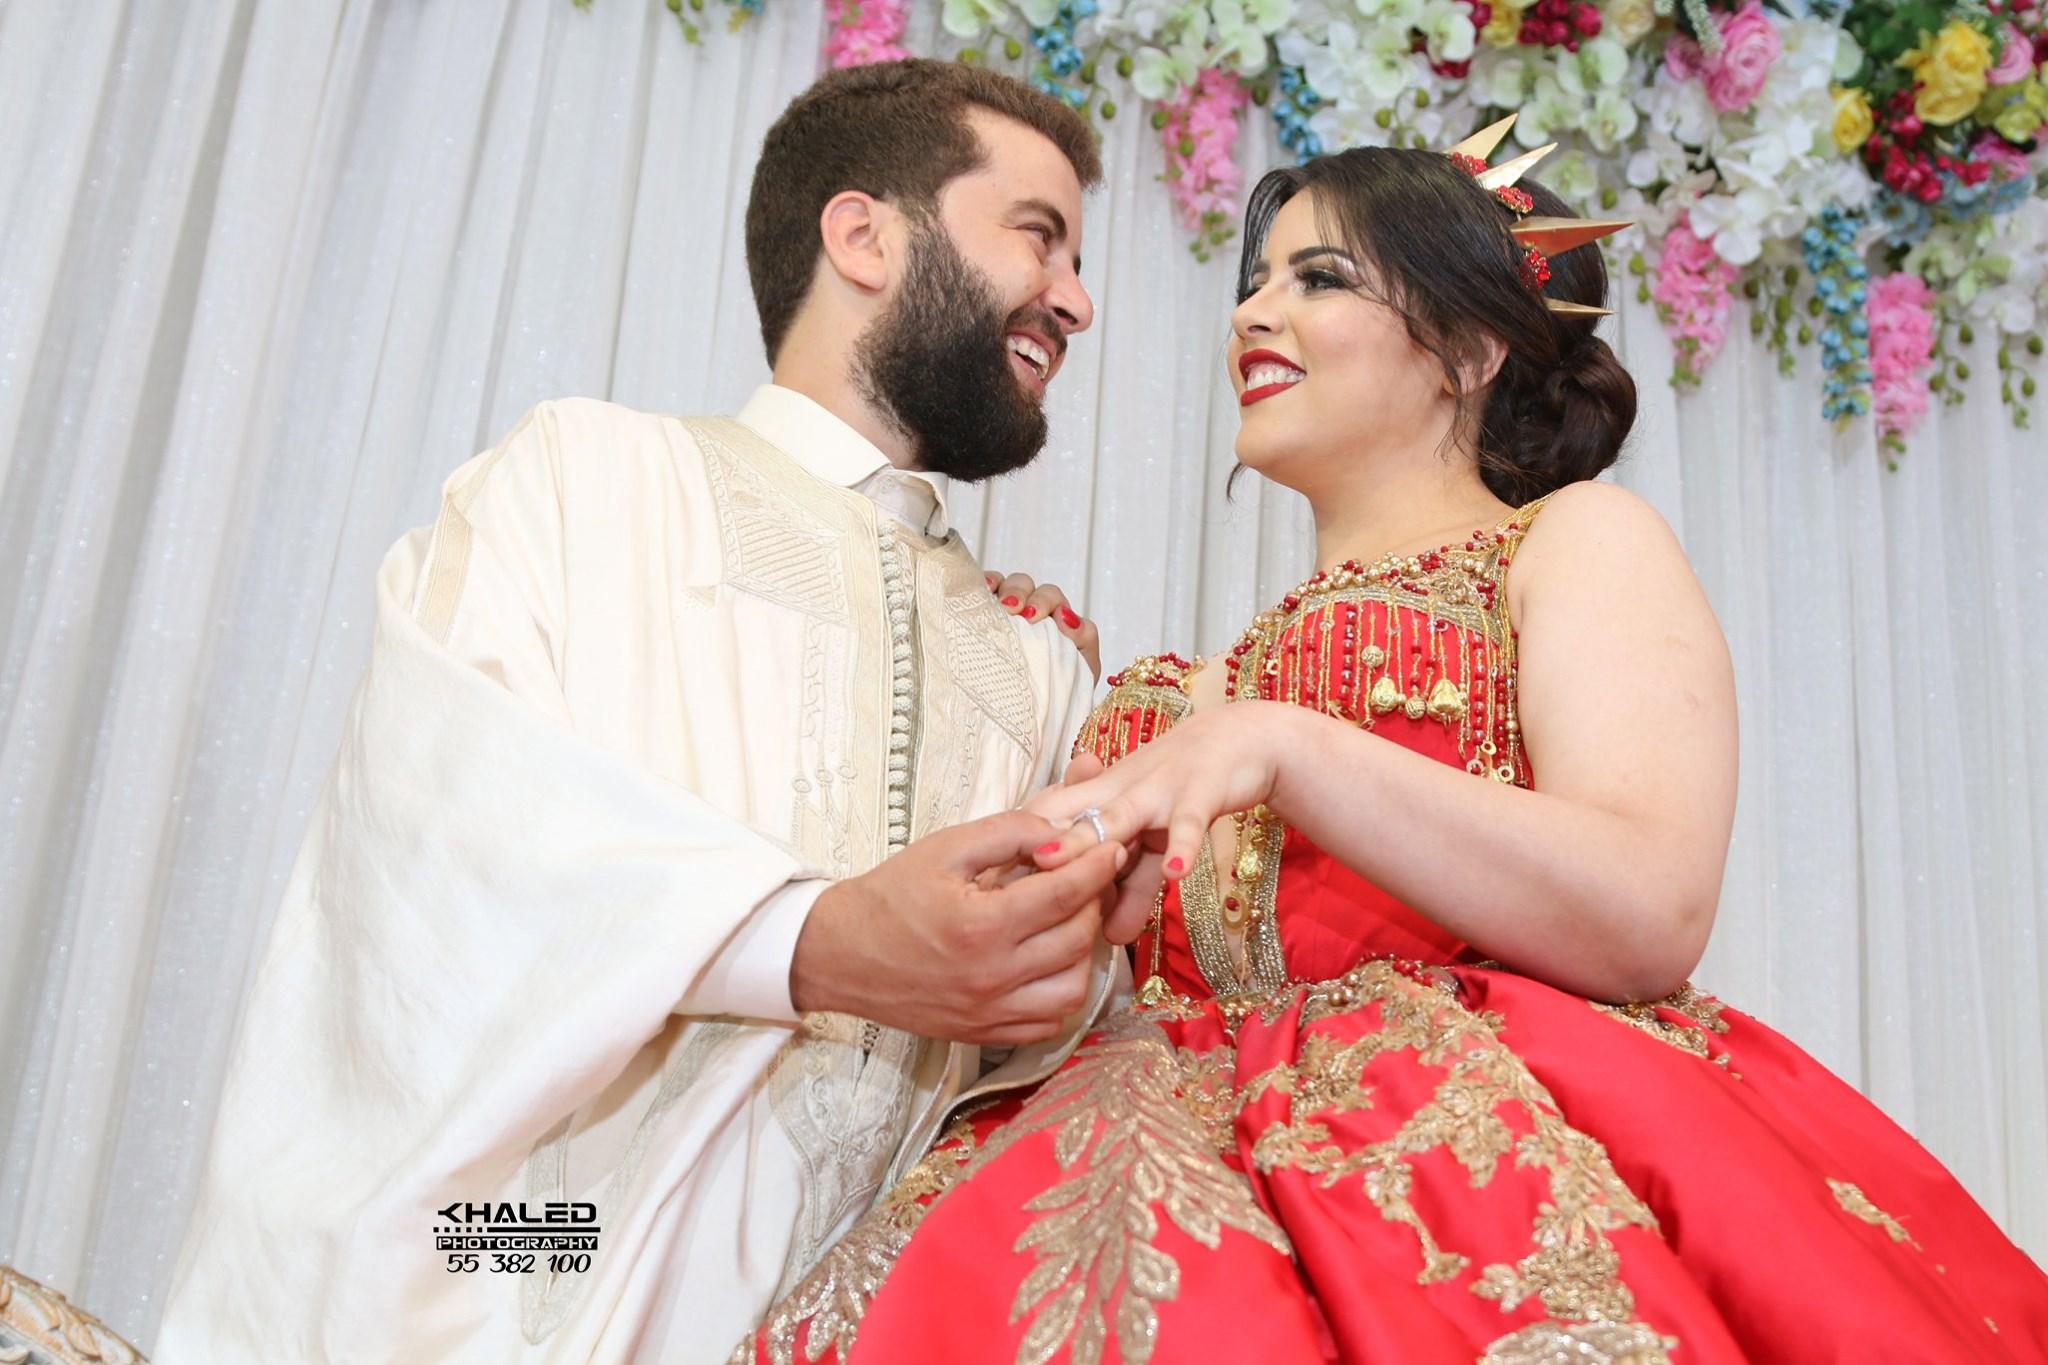 fida33_plus_belles_mariées_tunisiennes_186_2019